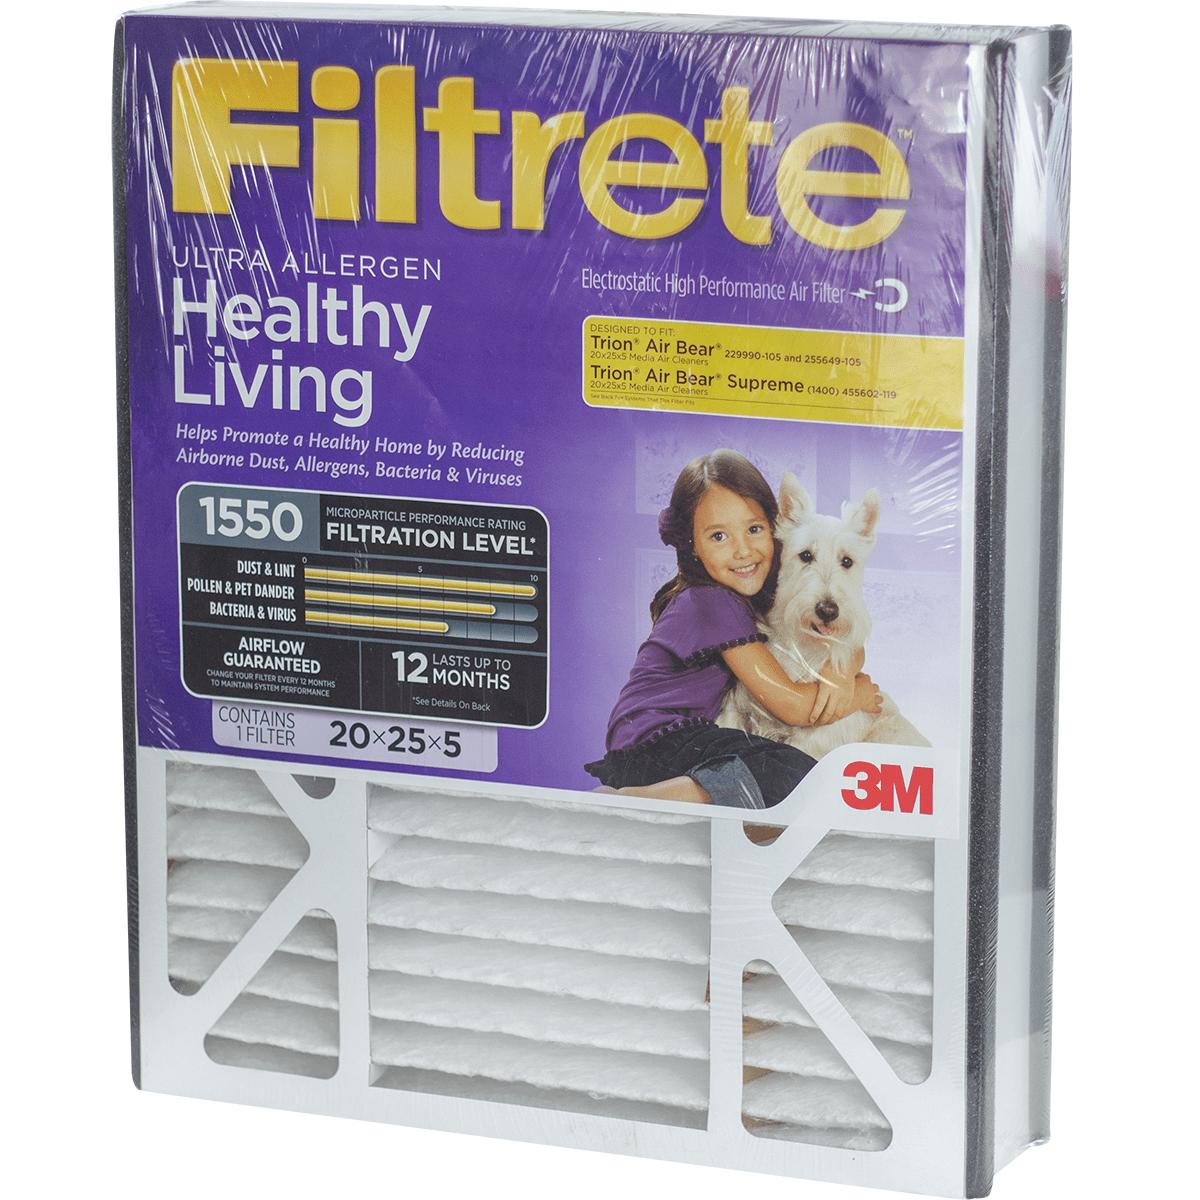 3m Filtrete Healthy Living 1550 Mpr 5-inch Ultra Allergen Reduction Filter